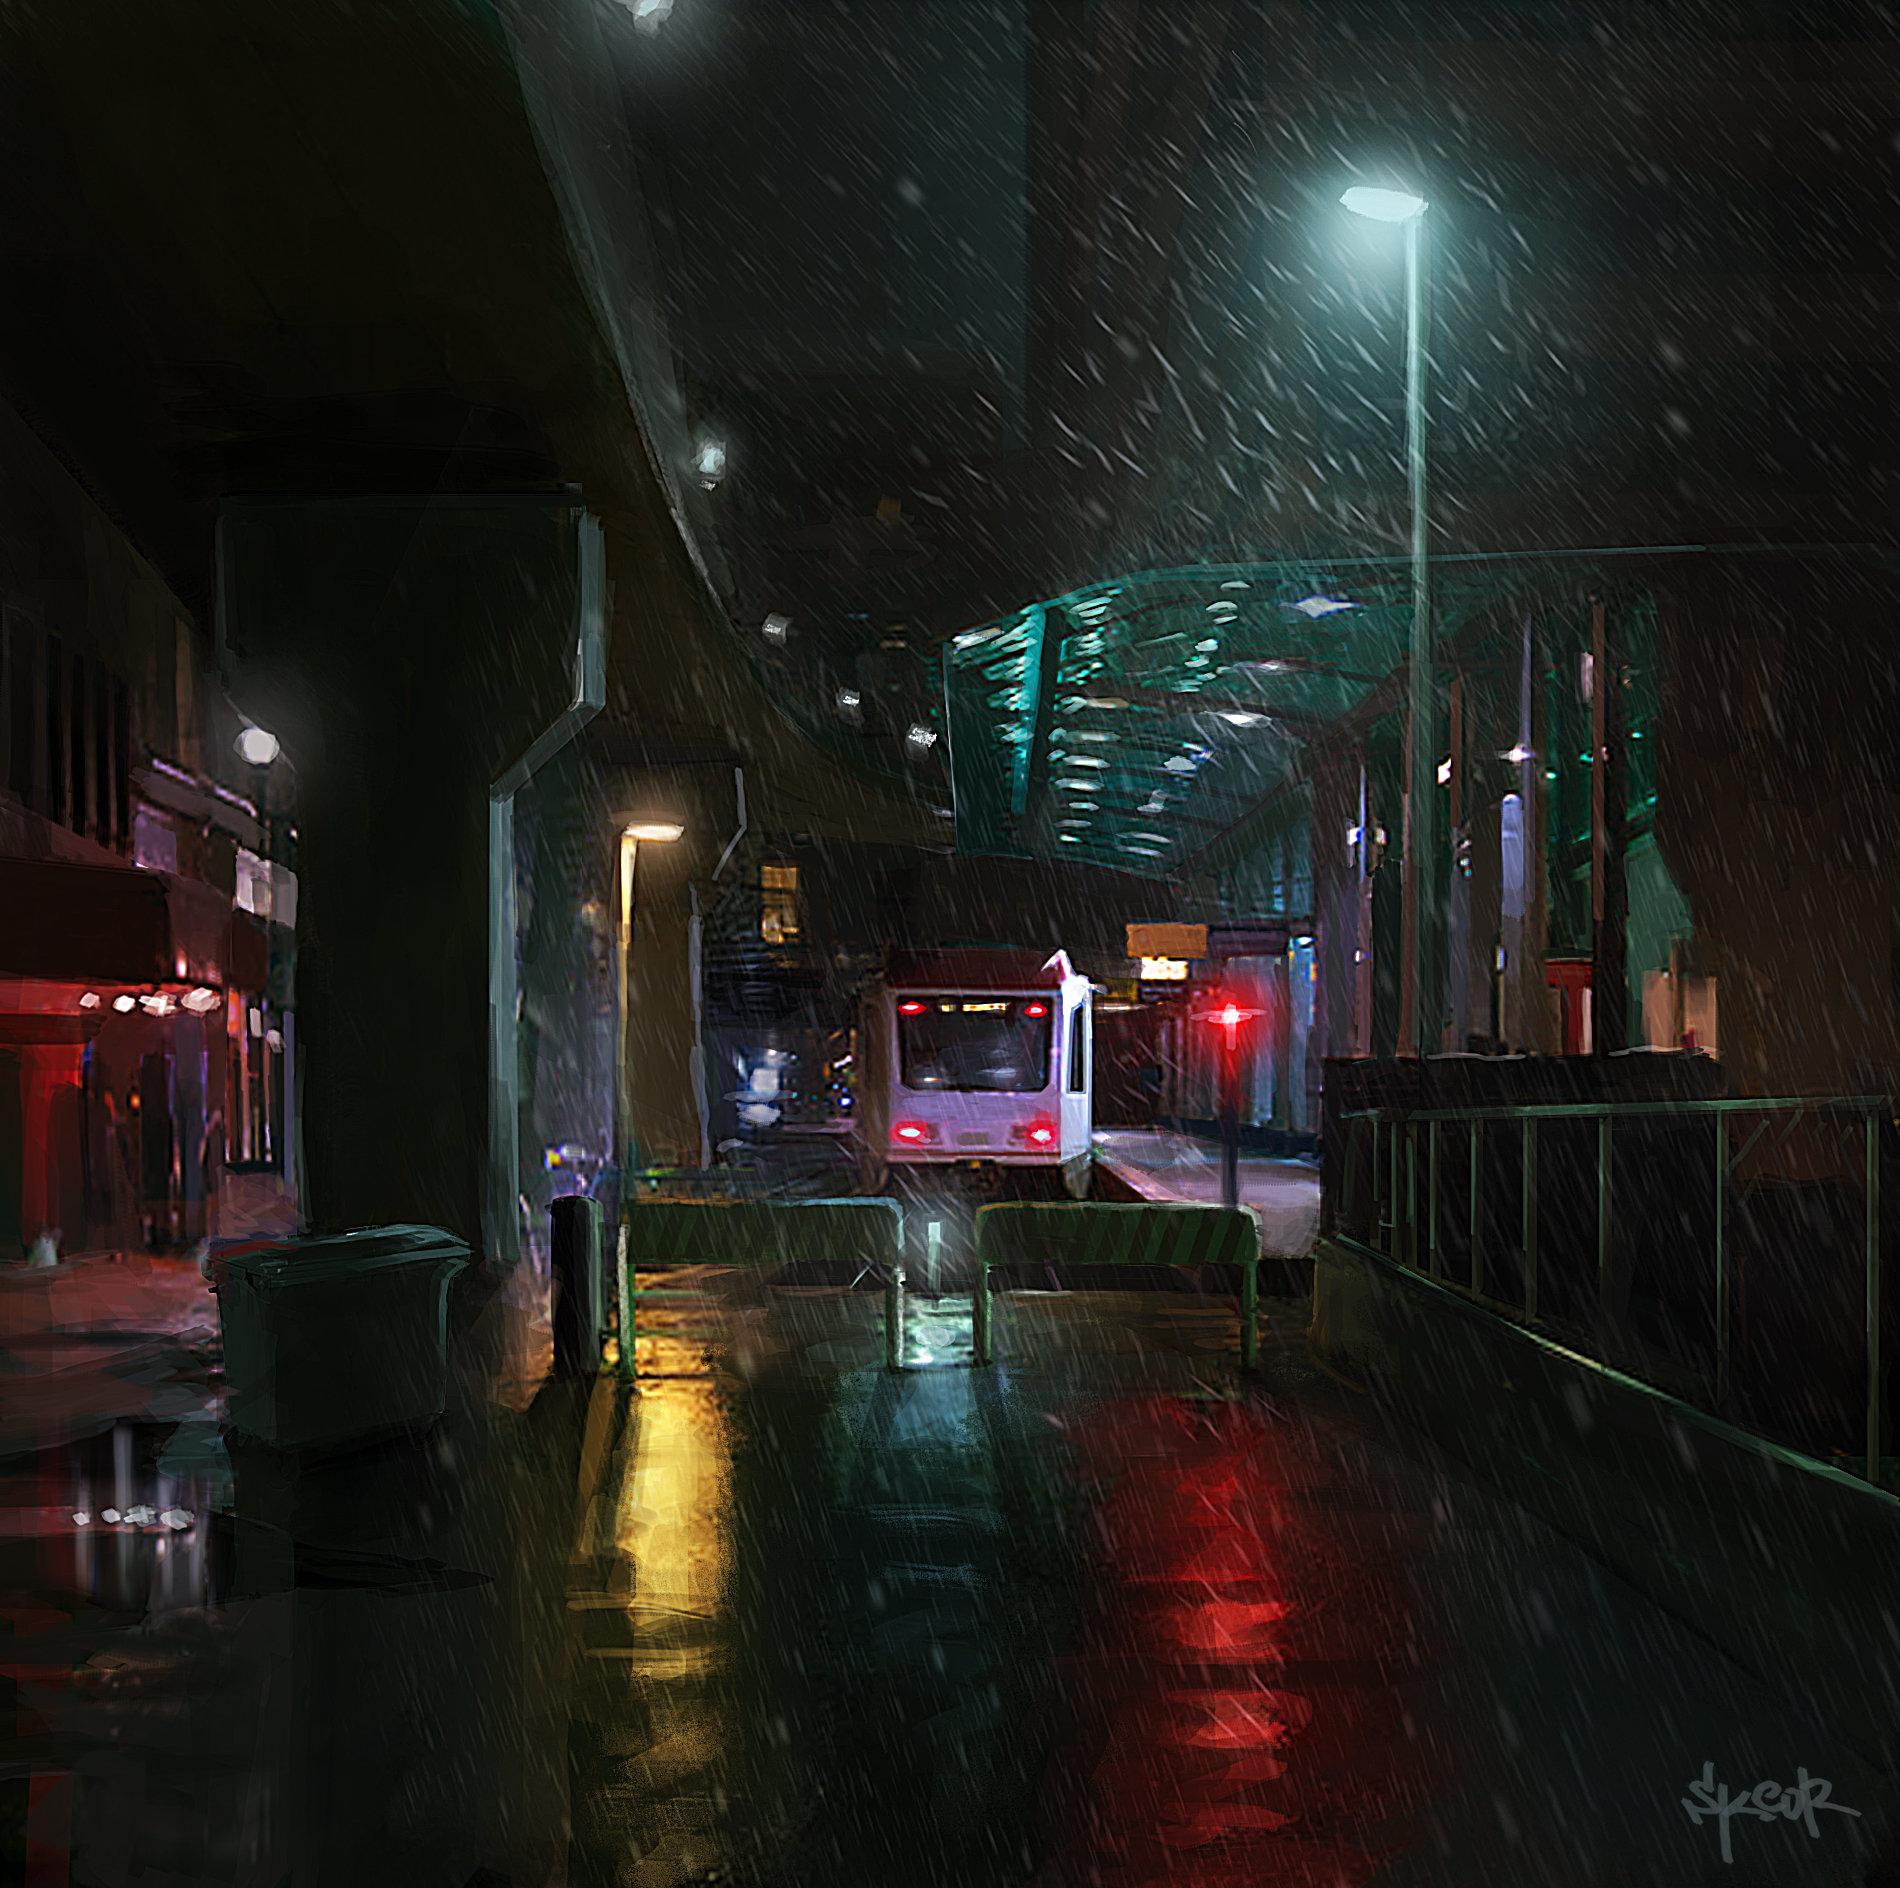 Anton skeor endstation tram